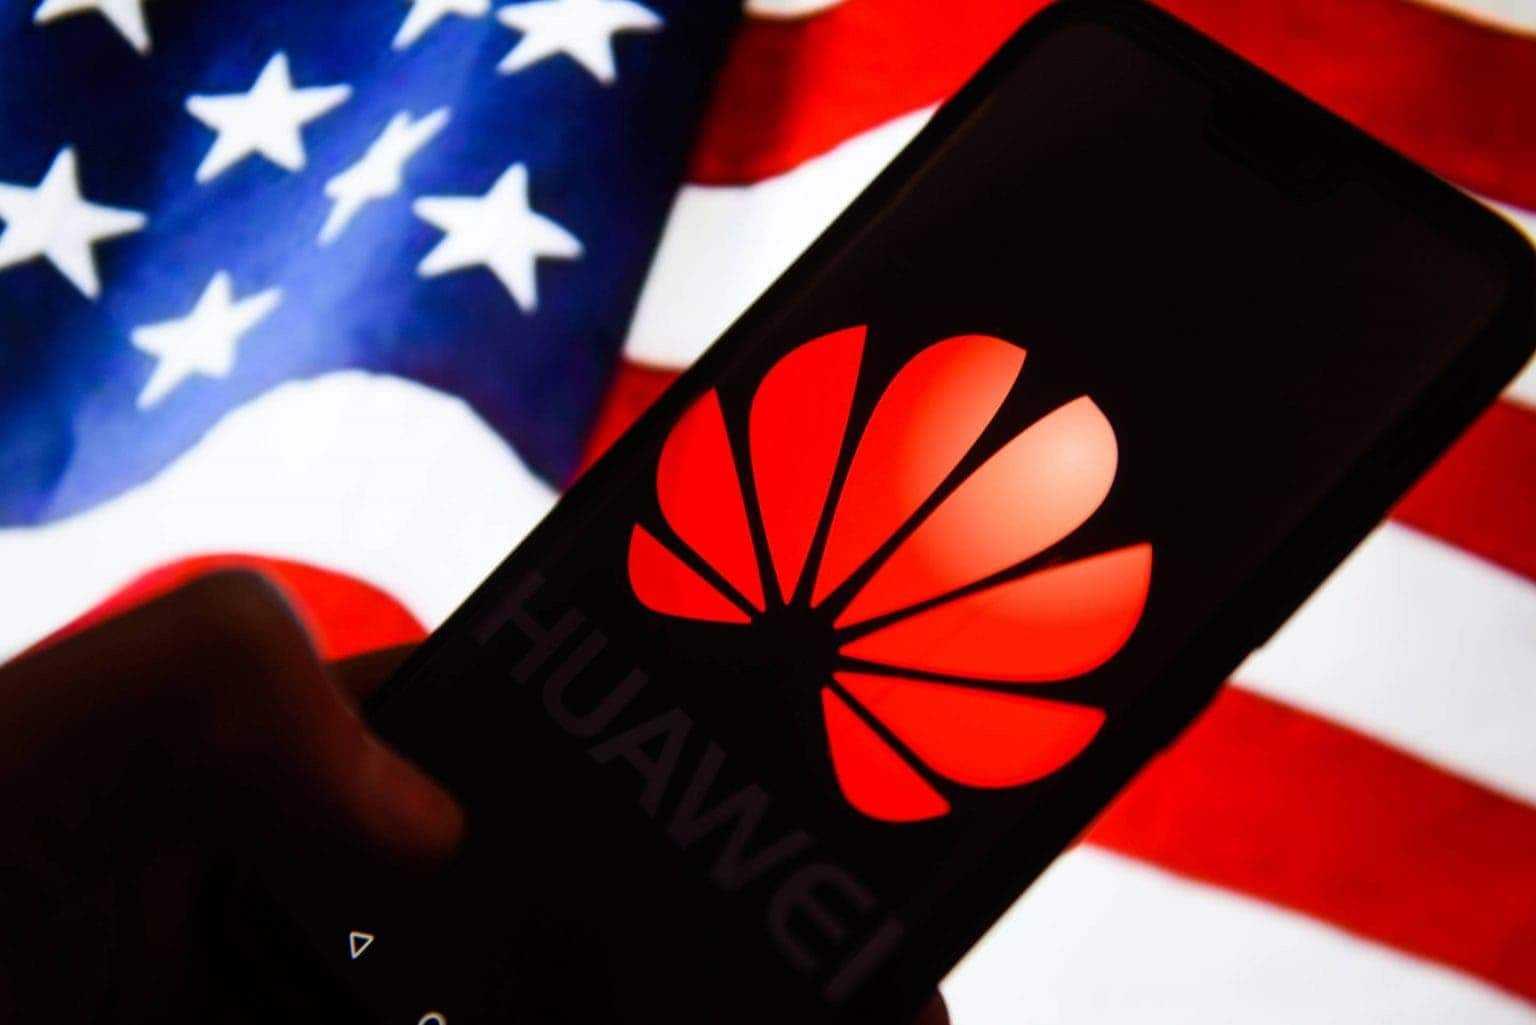 Huawei и Honor займут 4% и 2% рынка смартфонов в следующем году (gettyimages 1091190380 e1558469983644 1536x1025 1)